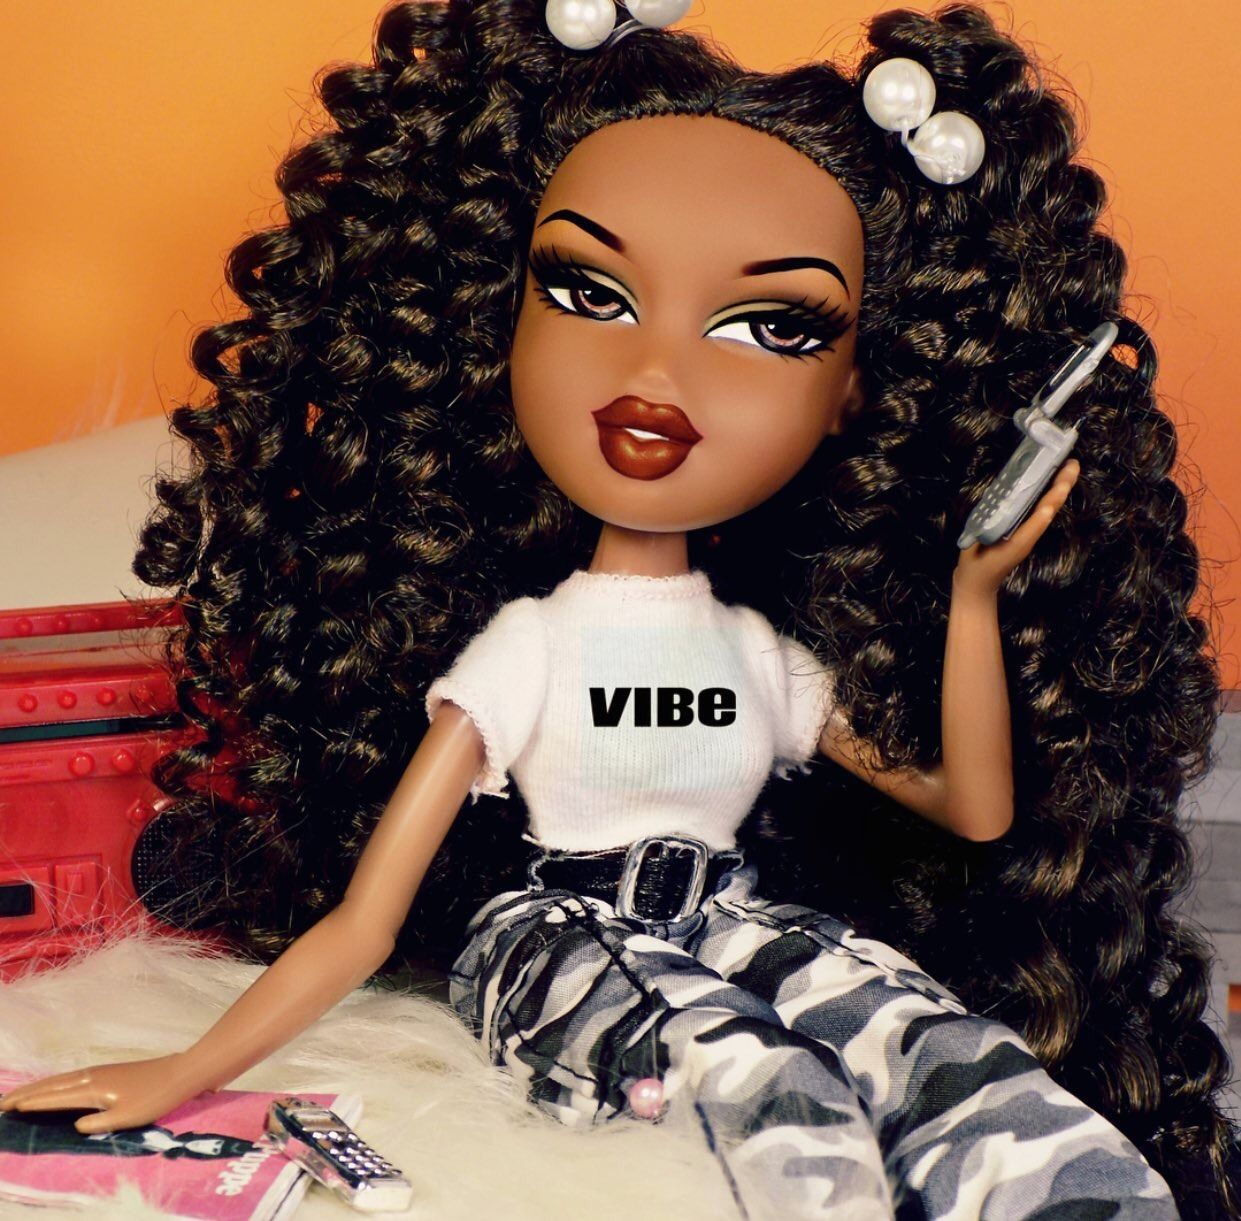 50 Shades Of Melanin Black Bratz Doll Bratz Girls Bratz Doll Outfits